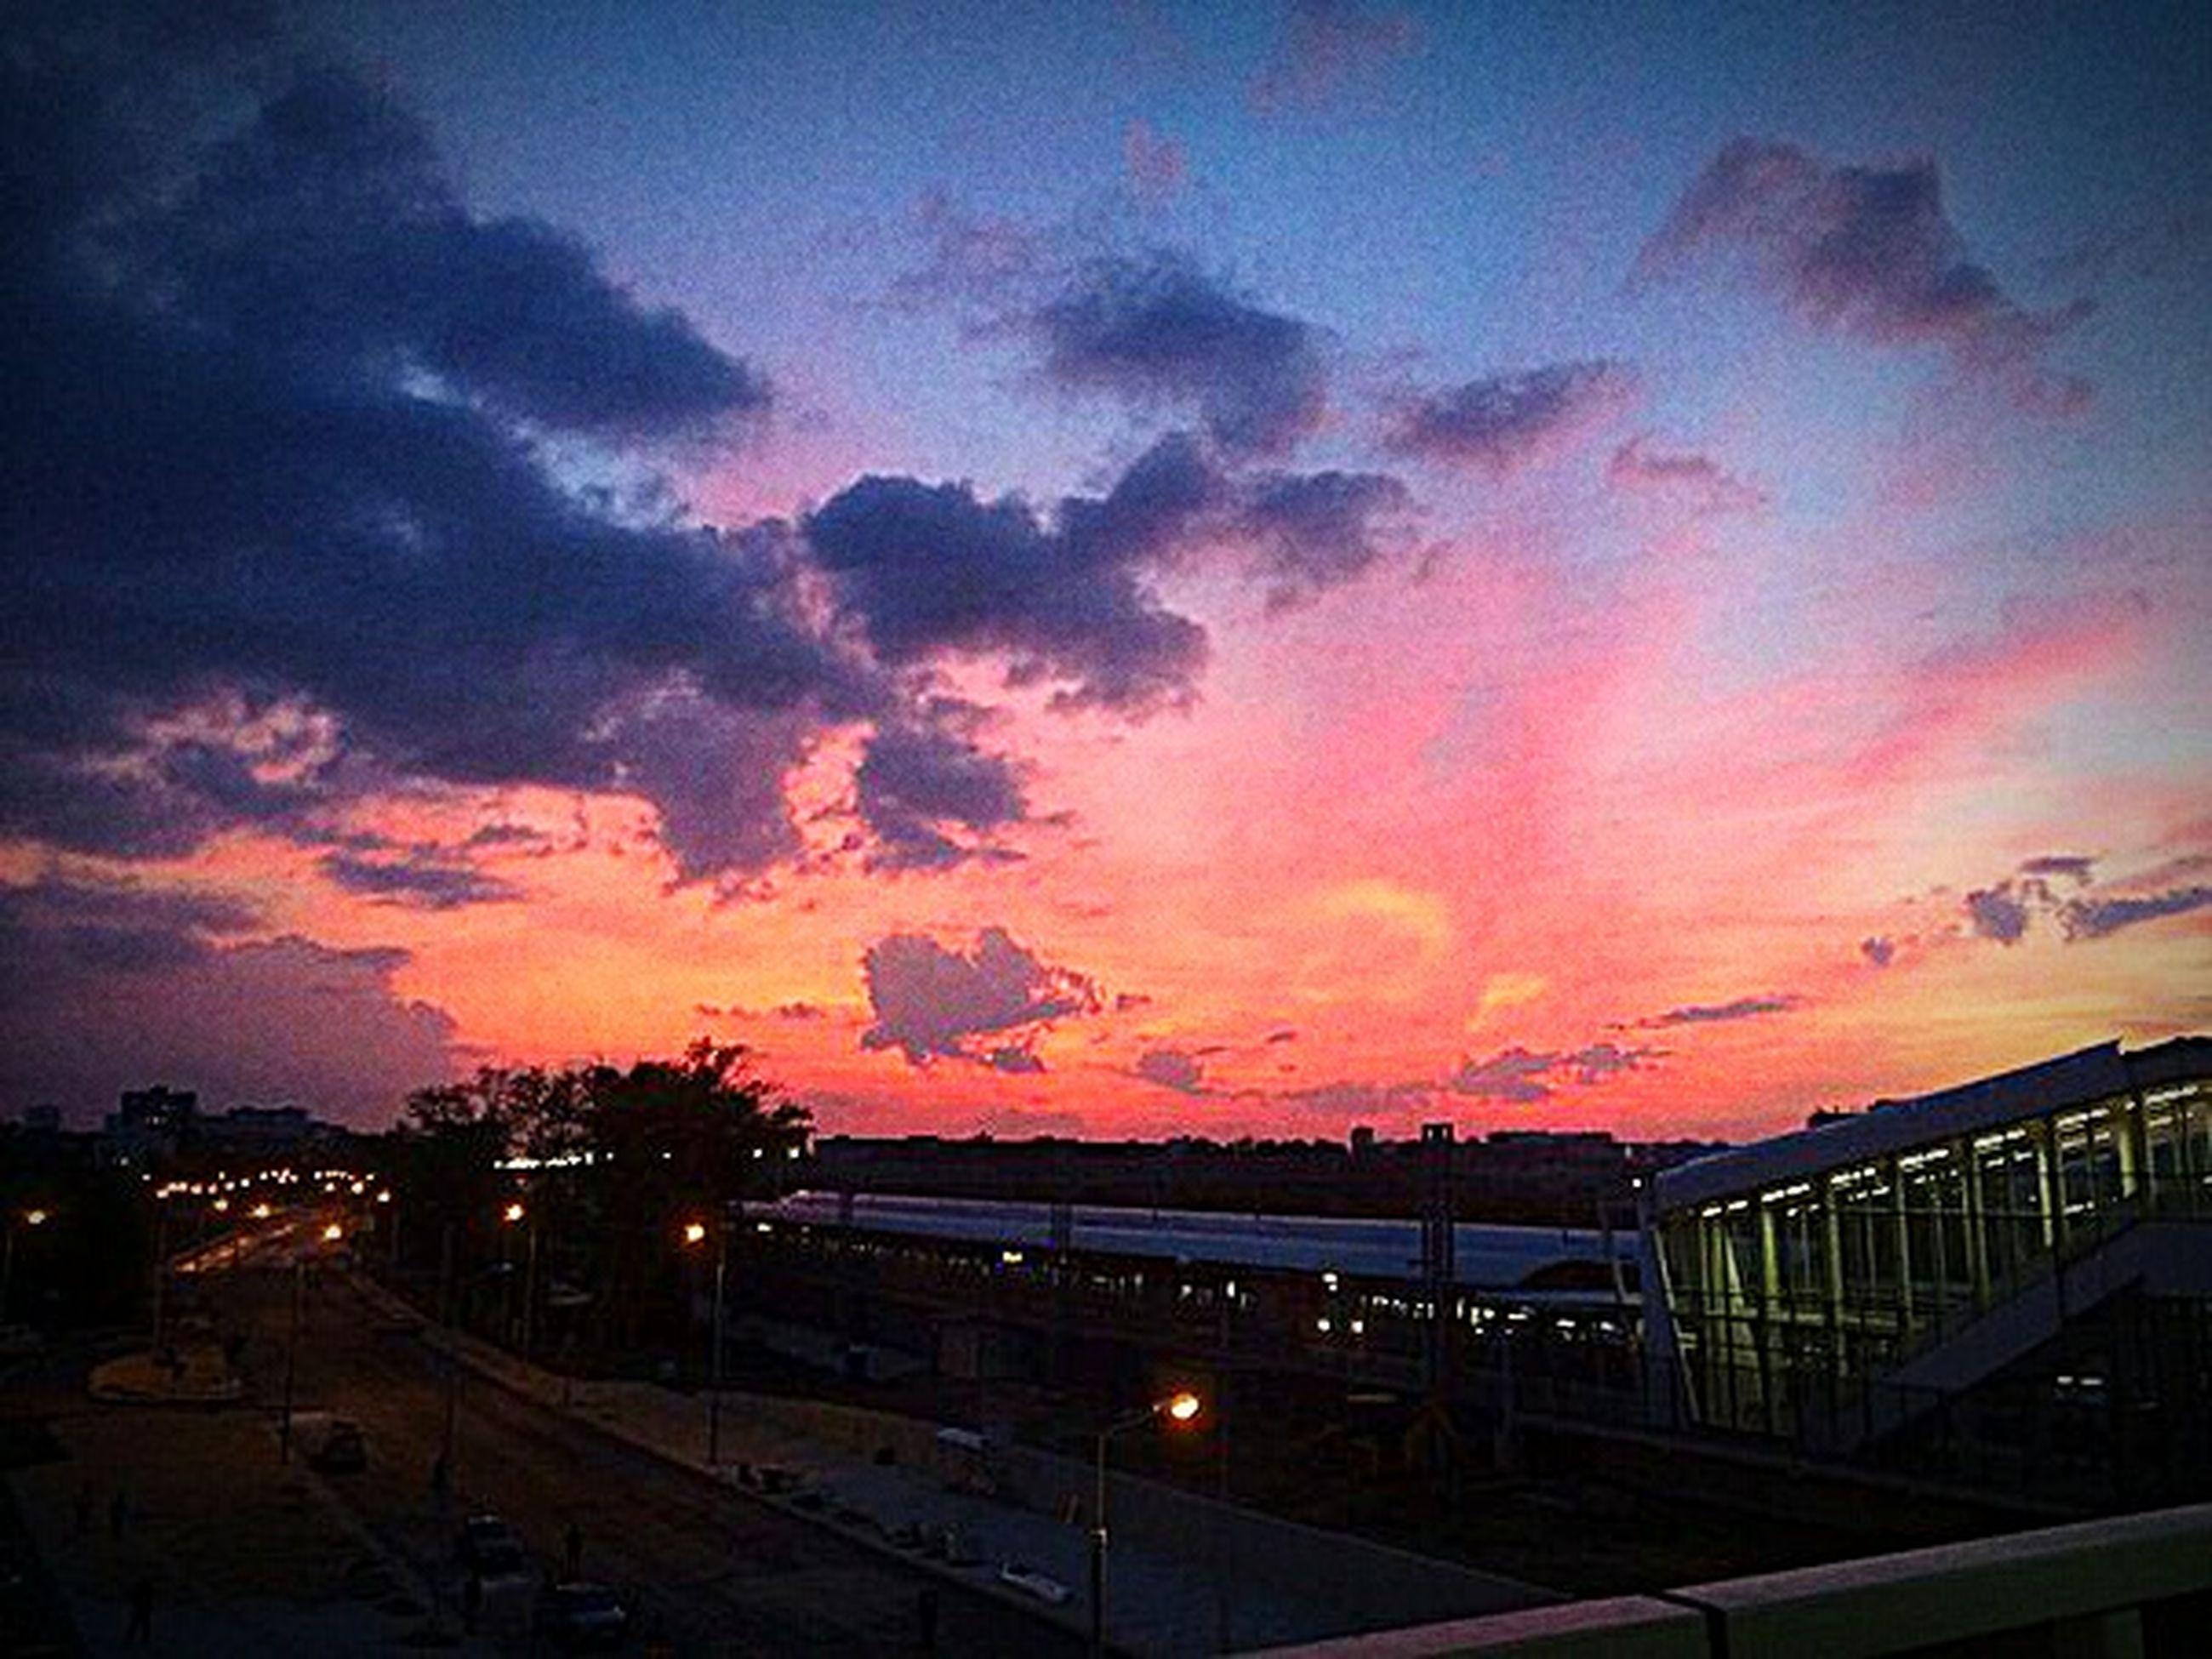 sunset, illuminated, sky, cloud - sky, dusk, cloud, scenics, beauty in nature, dramatic sky, majestic, city life, atmospheric mood, outdoors, romantic sky, dark, tranquil scene, atmosphere, orange color, nature, modern, moody sky